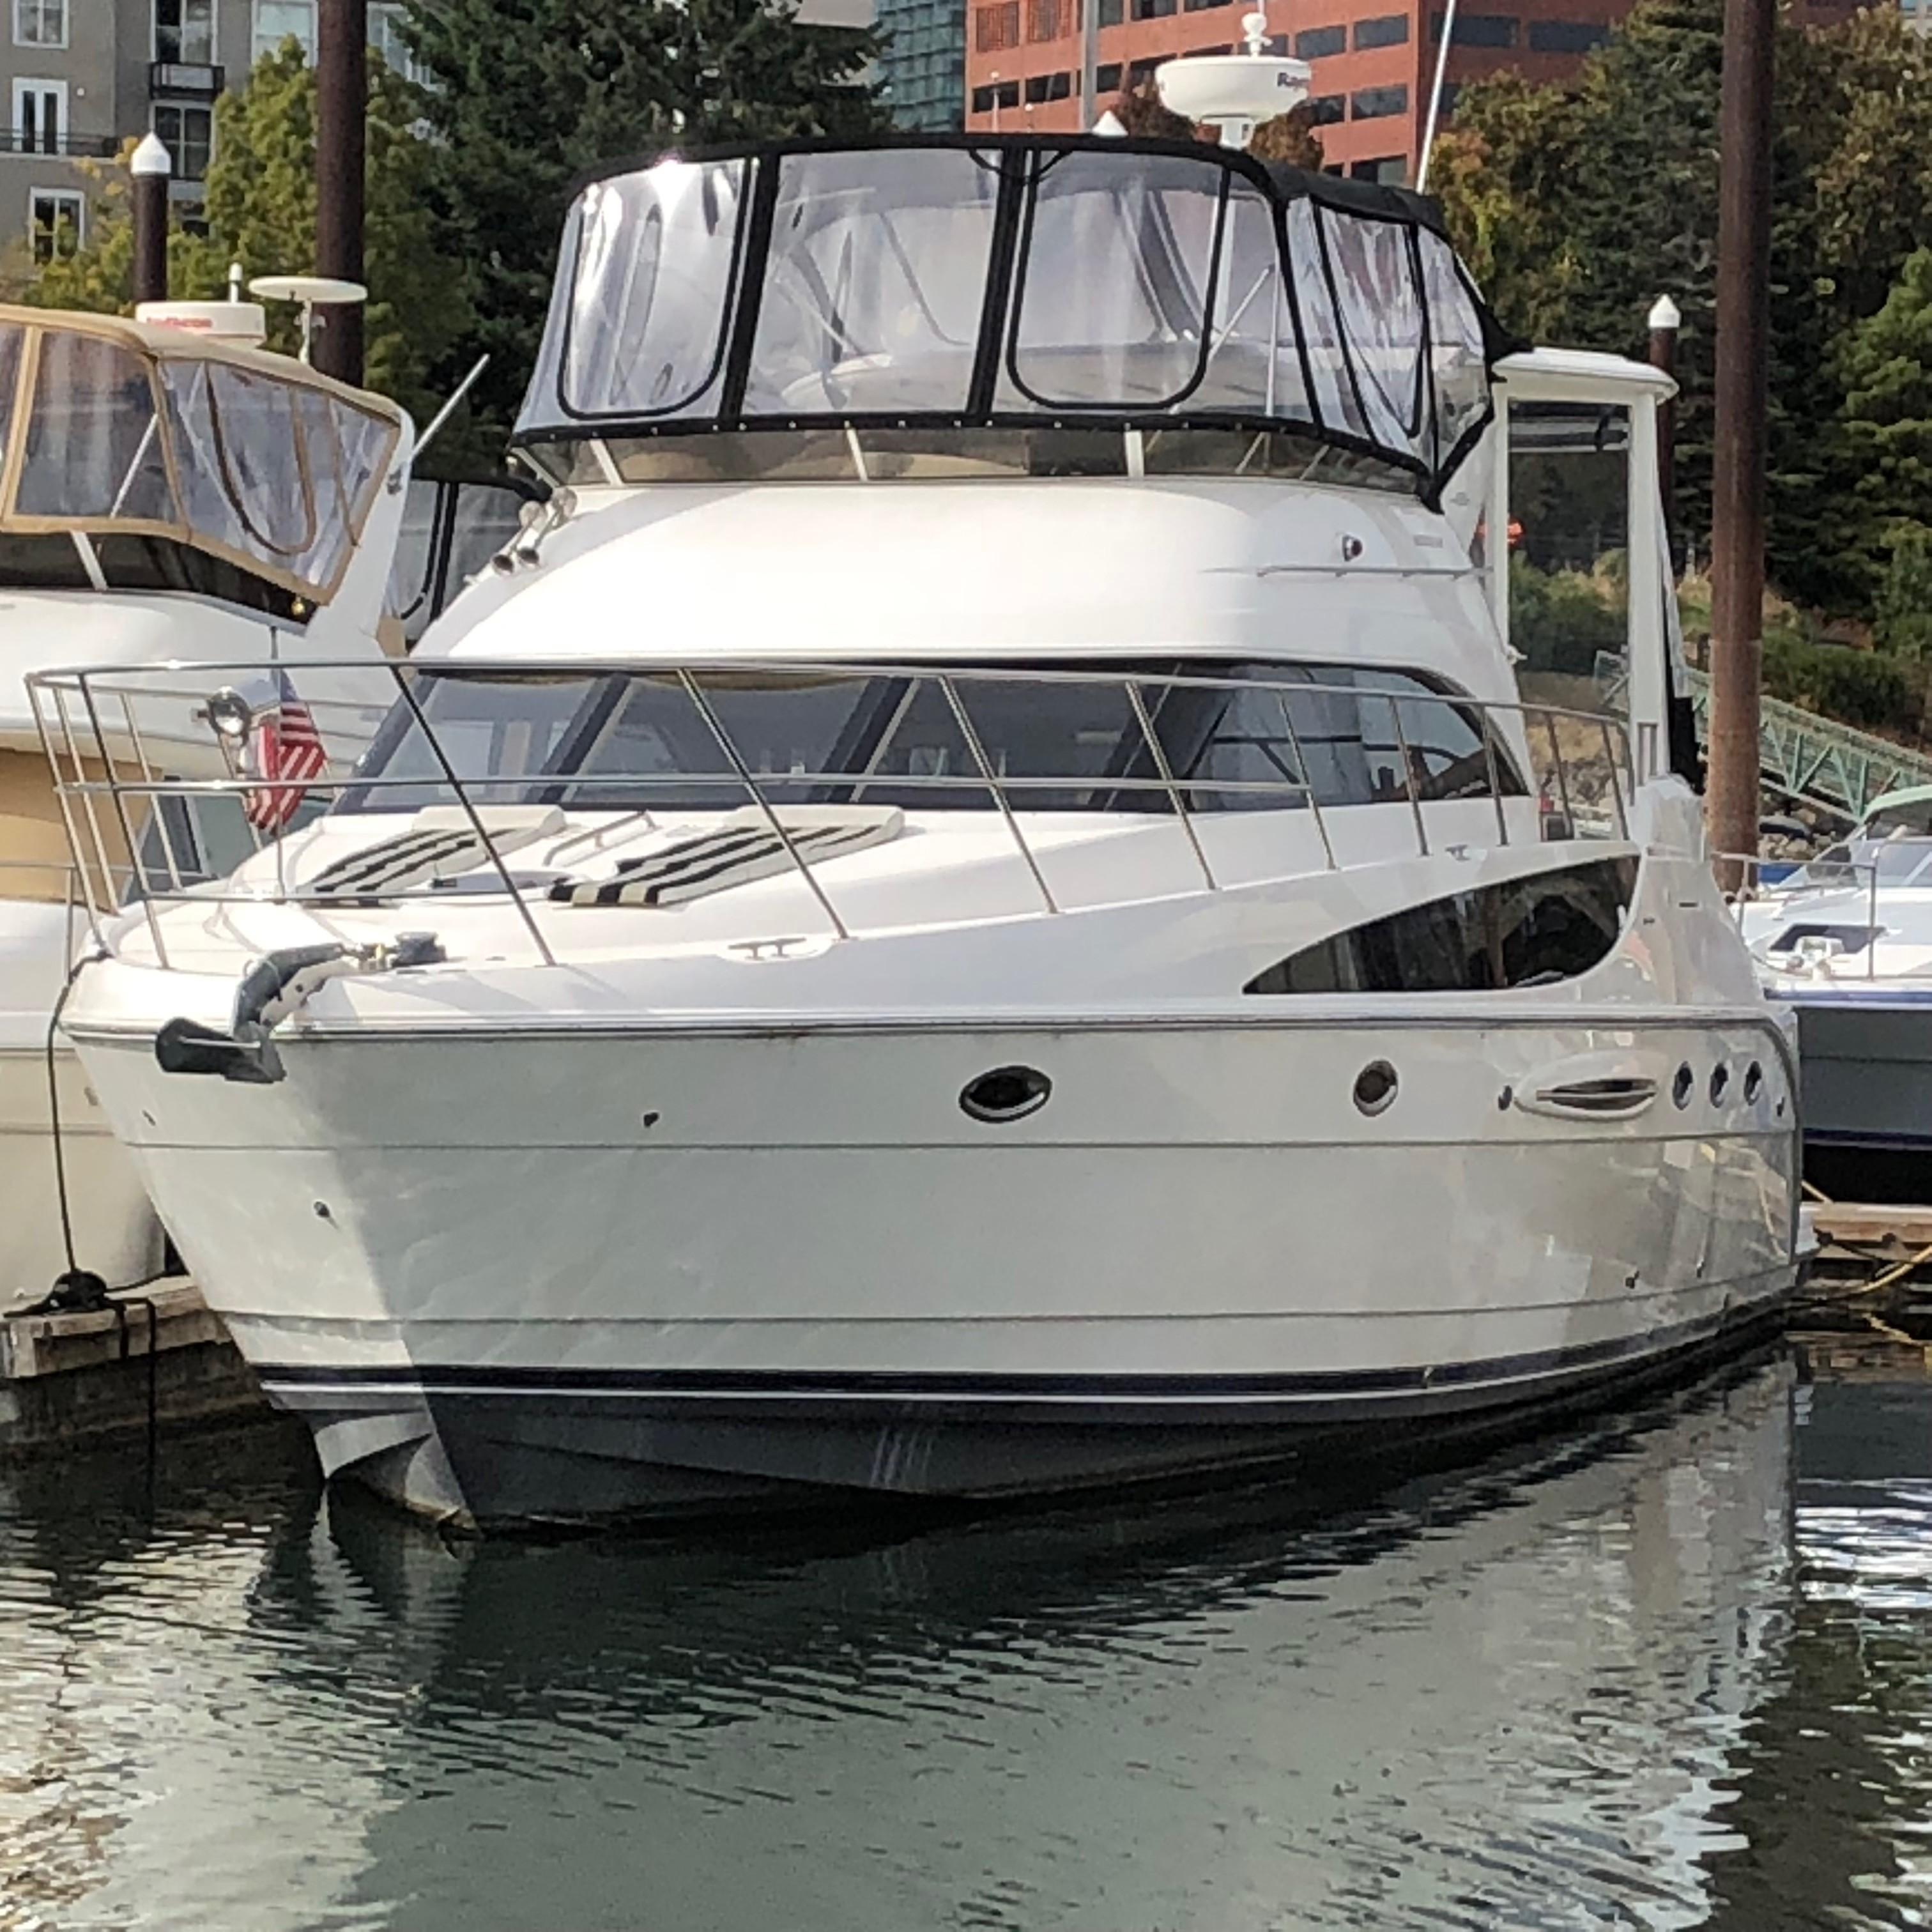 459 Motoryacht - 50 North